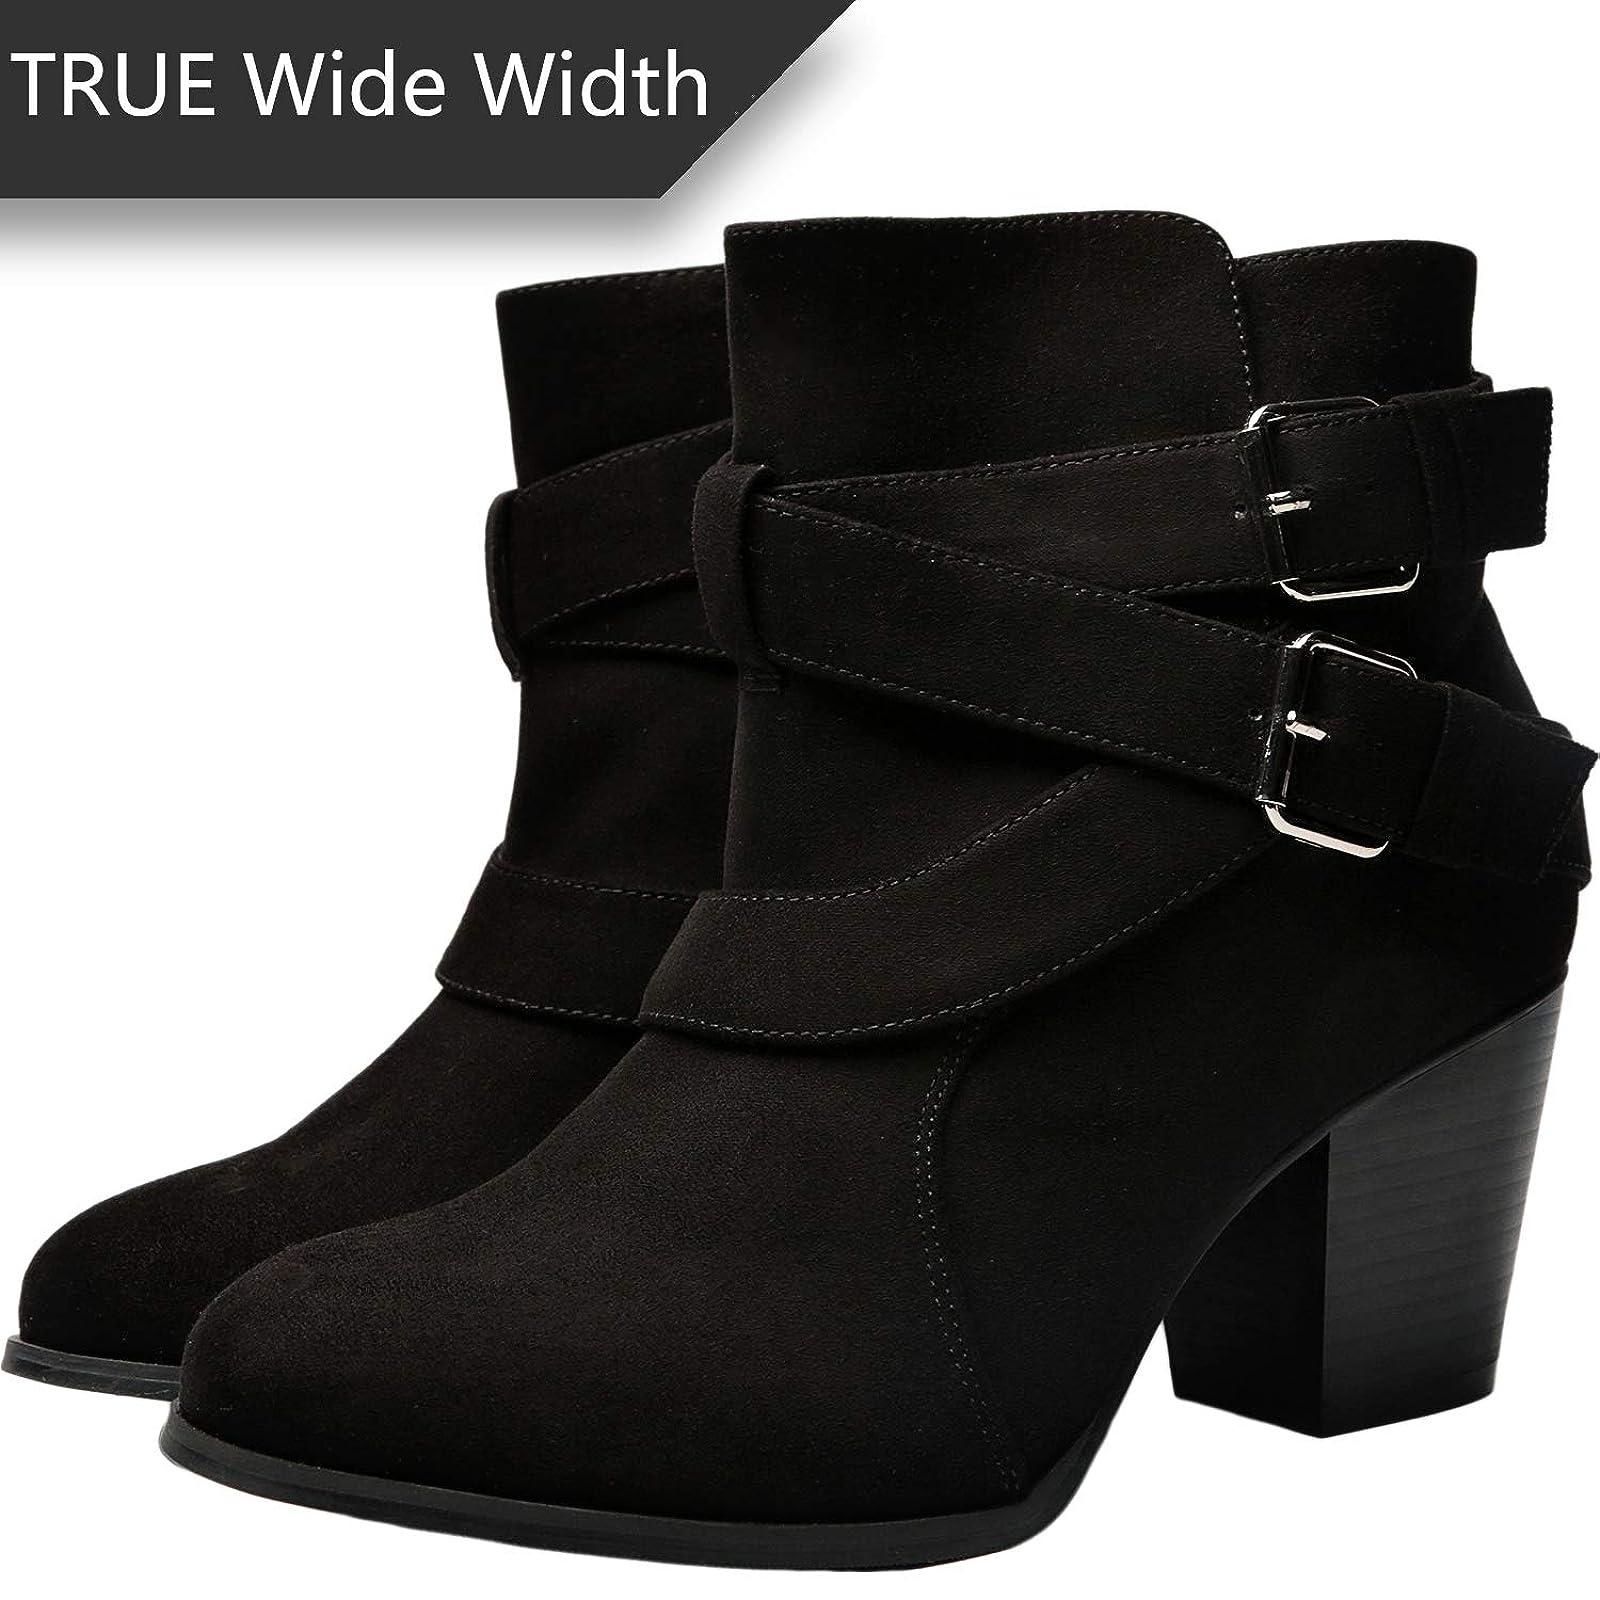 Luoika Women's Wide Width Ankle Boots - Black 10 XW US - 4